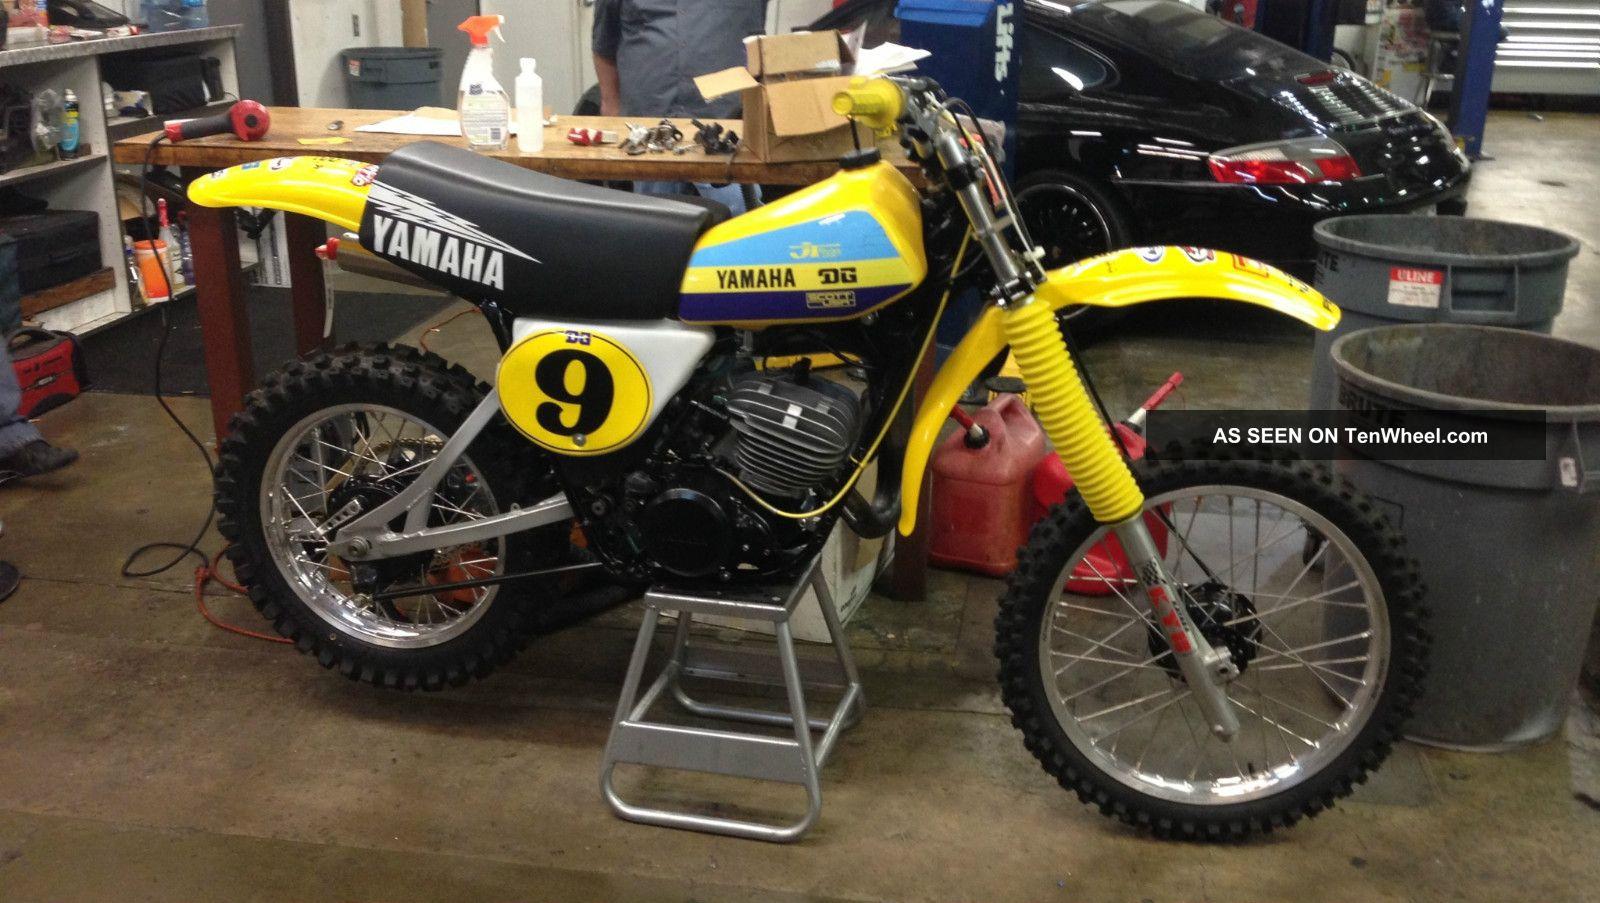 1978 Yamaha Yz250 YZ photo